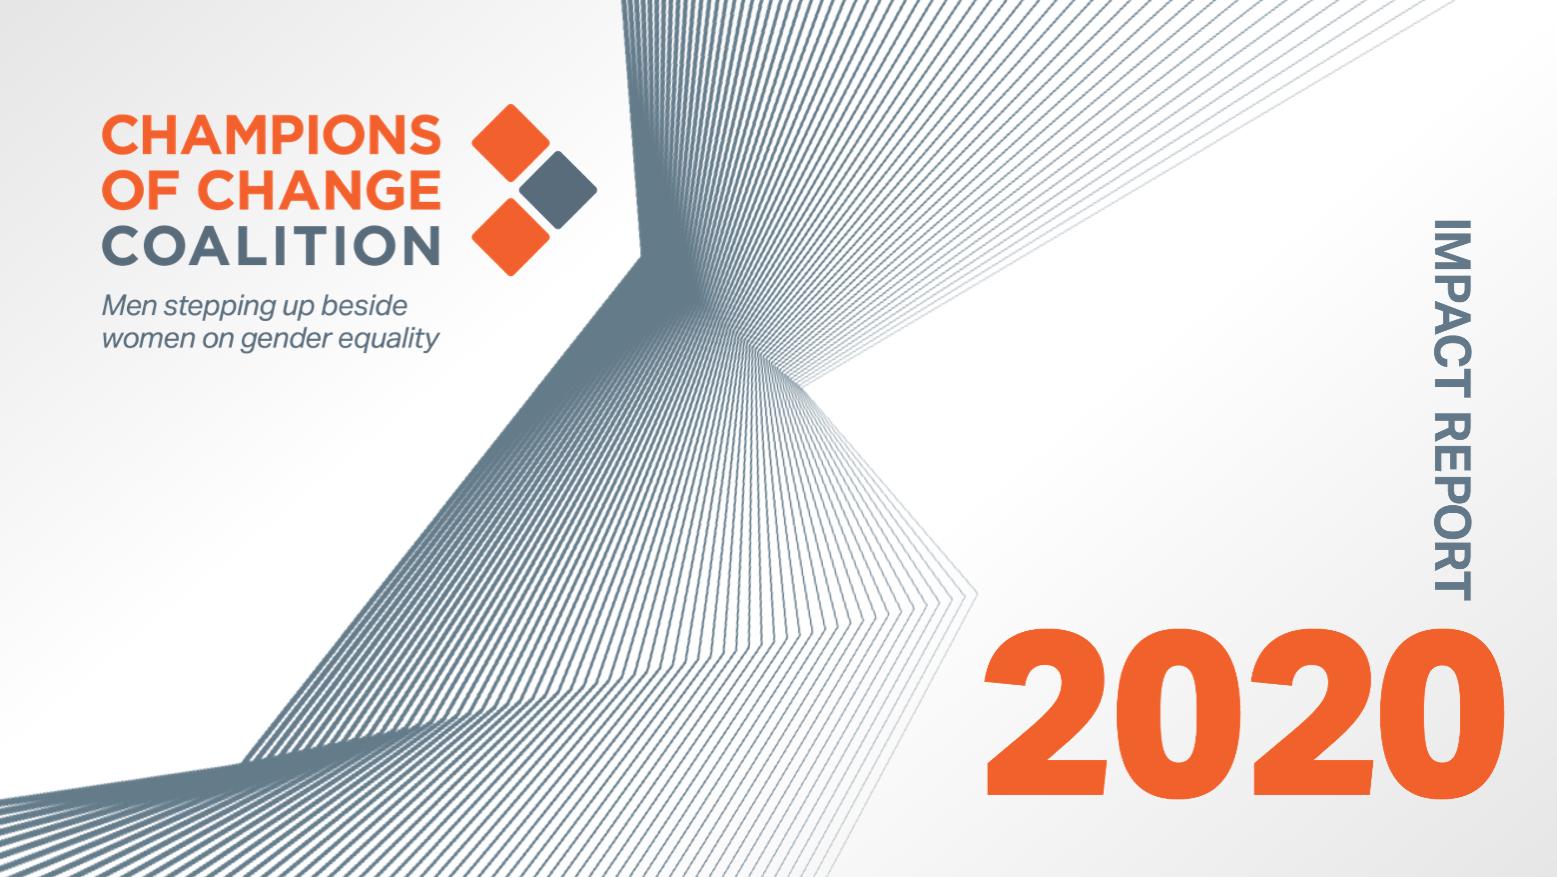 Champions of Change Coalition Impact Report 2020